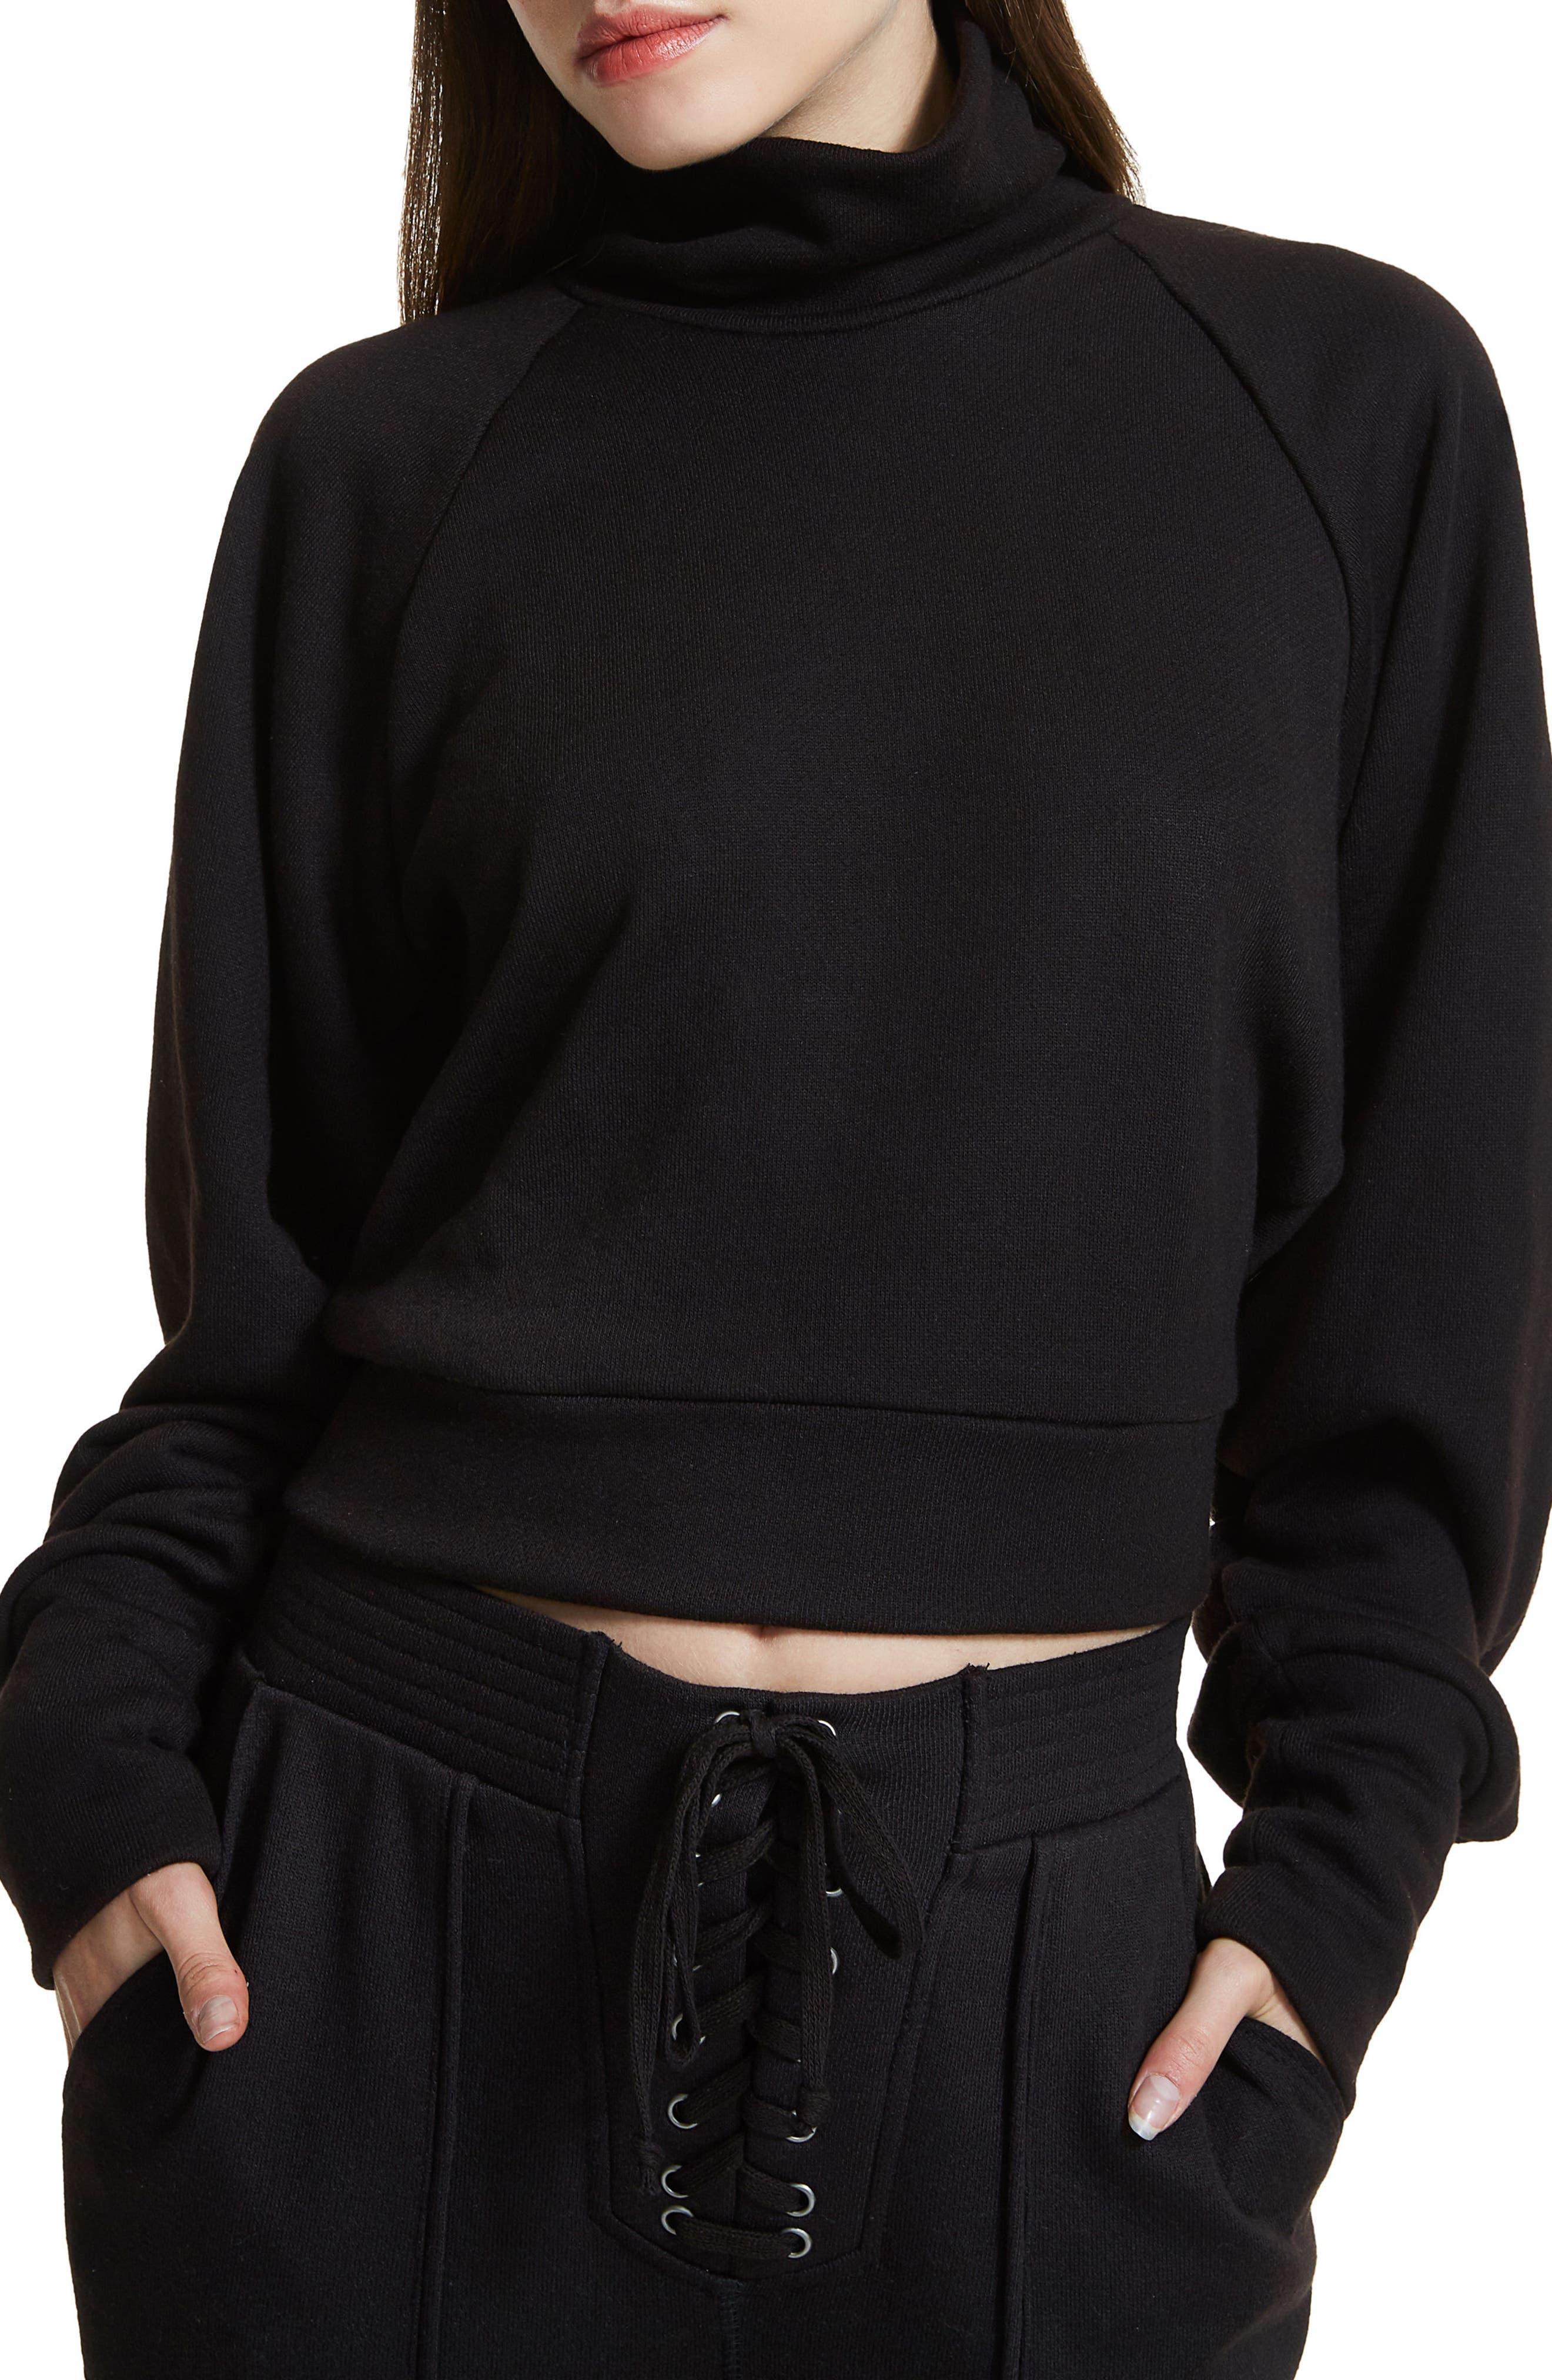 Jaxon Crop Turtleneck Sweatshirt,                         Main,                         color, Noir